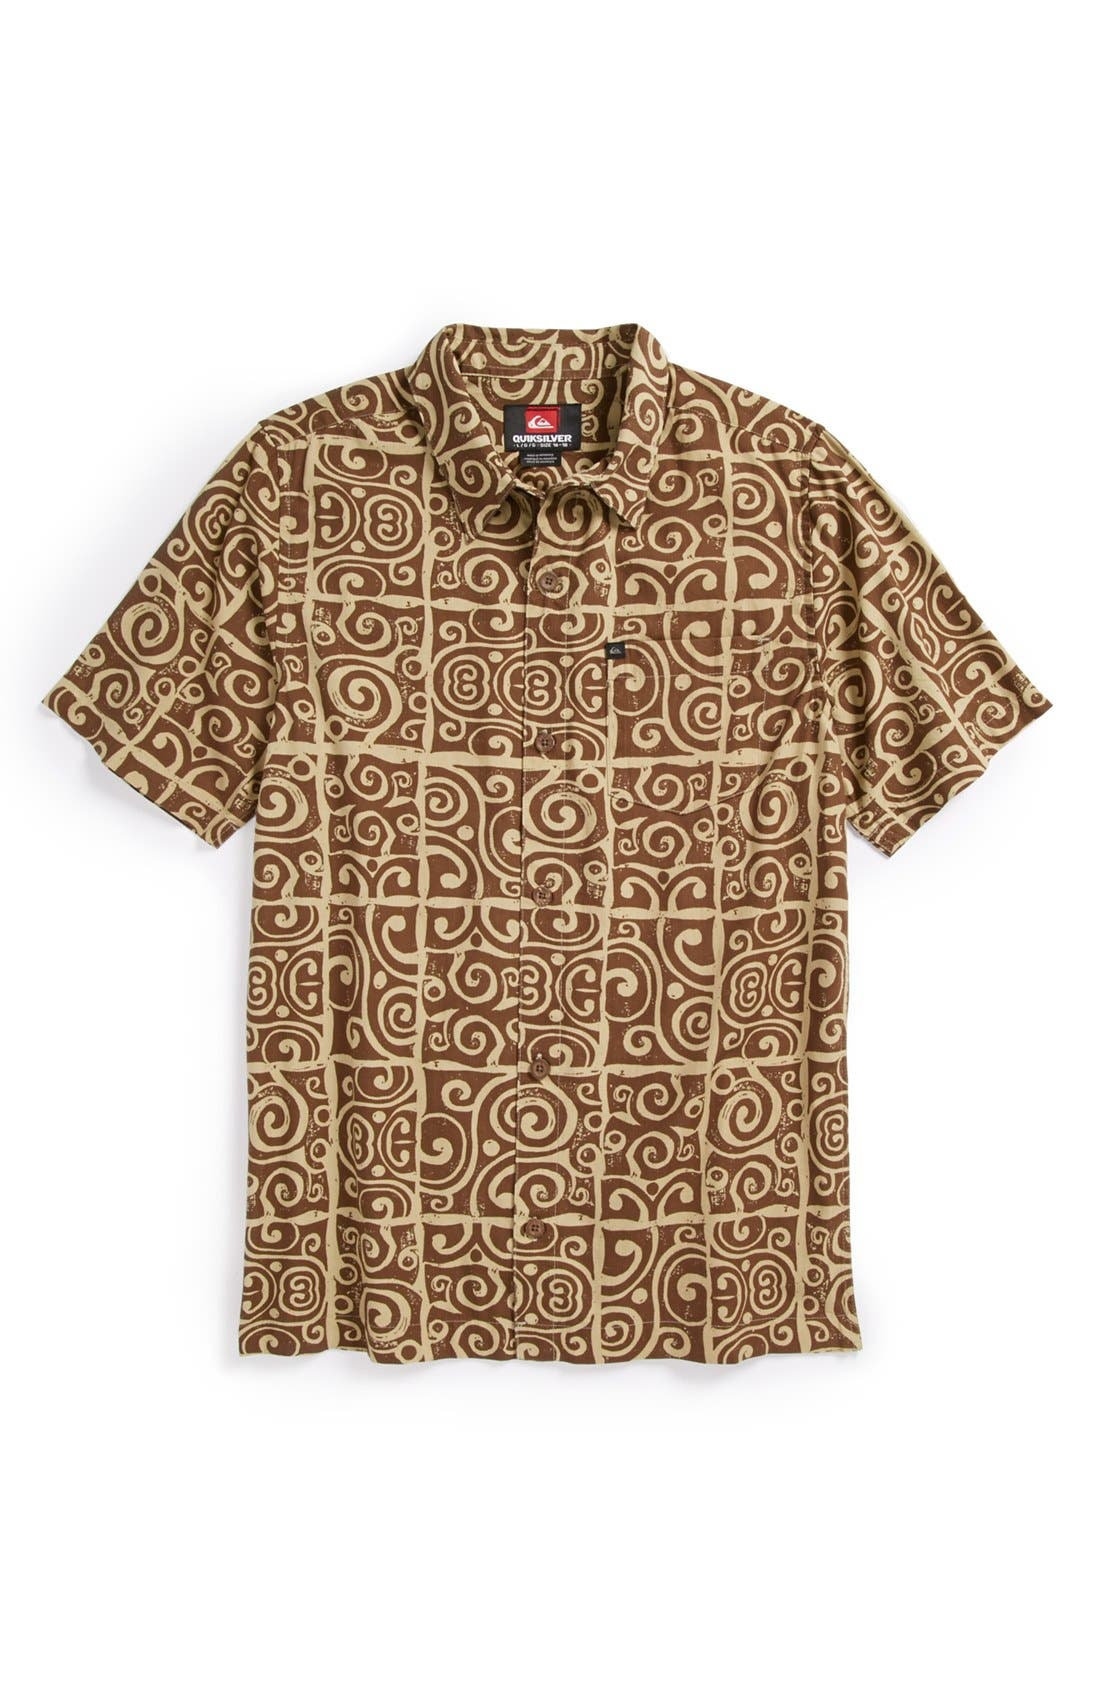 Alternate Image 1 Selected - Quiksilver 'Island Time' Sport Shirt (Little Boys & Big Boys)